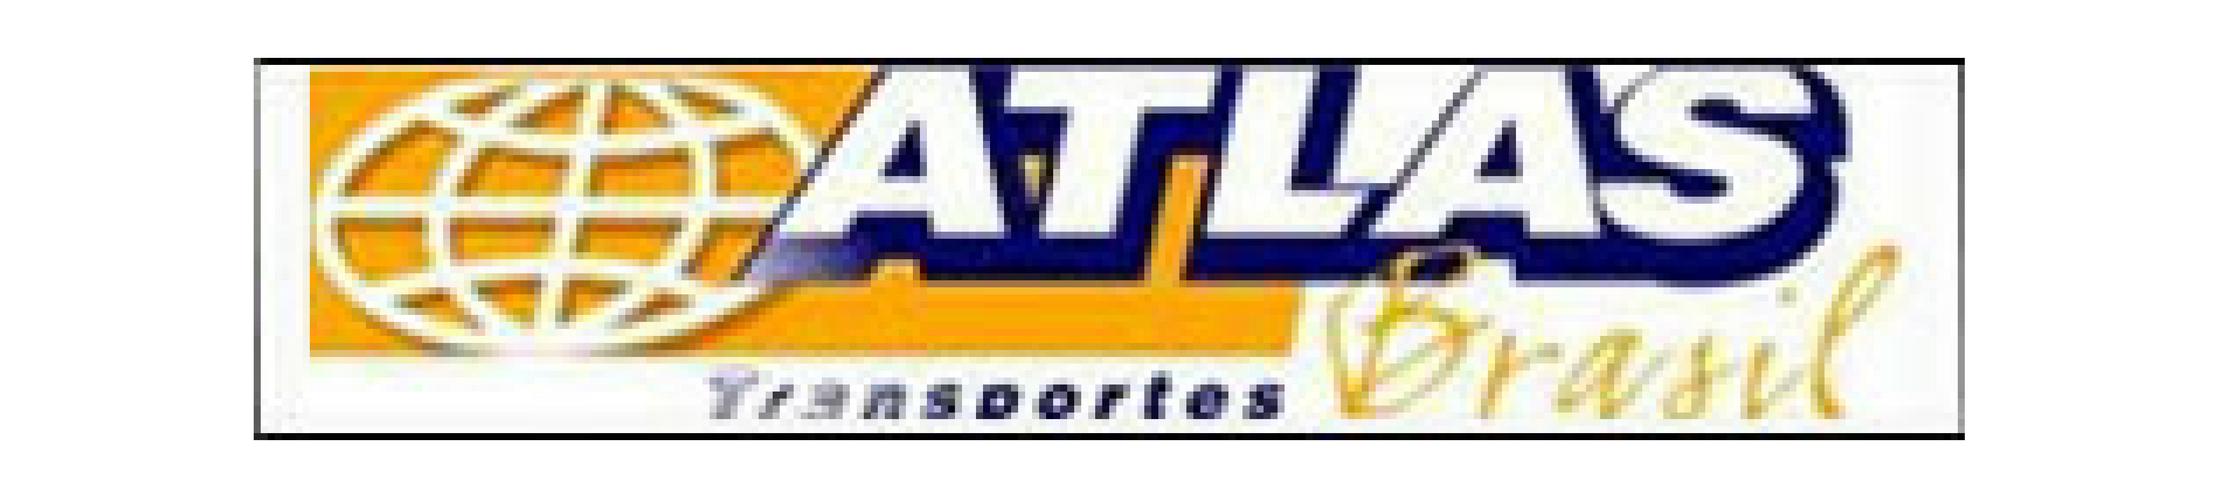 EMPRESA-DE-TRANSPORTES-ATLAS.jpg